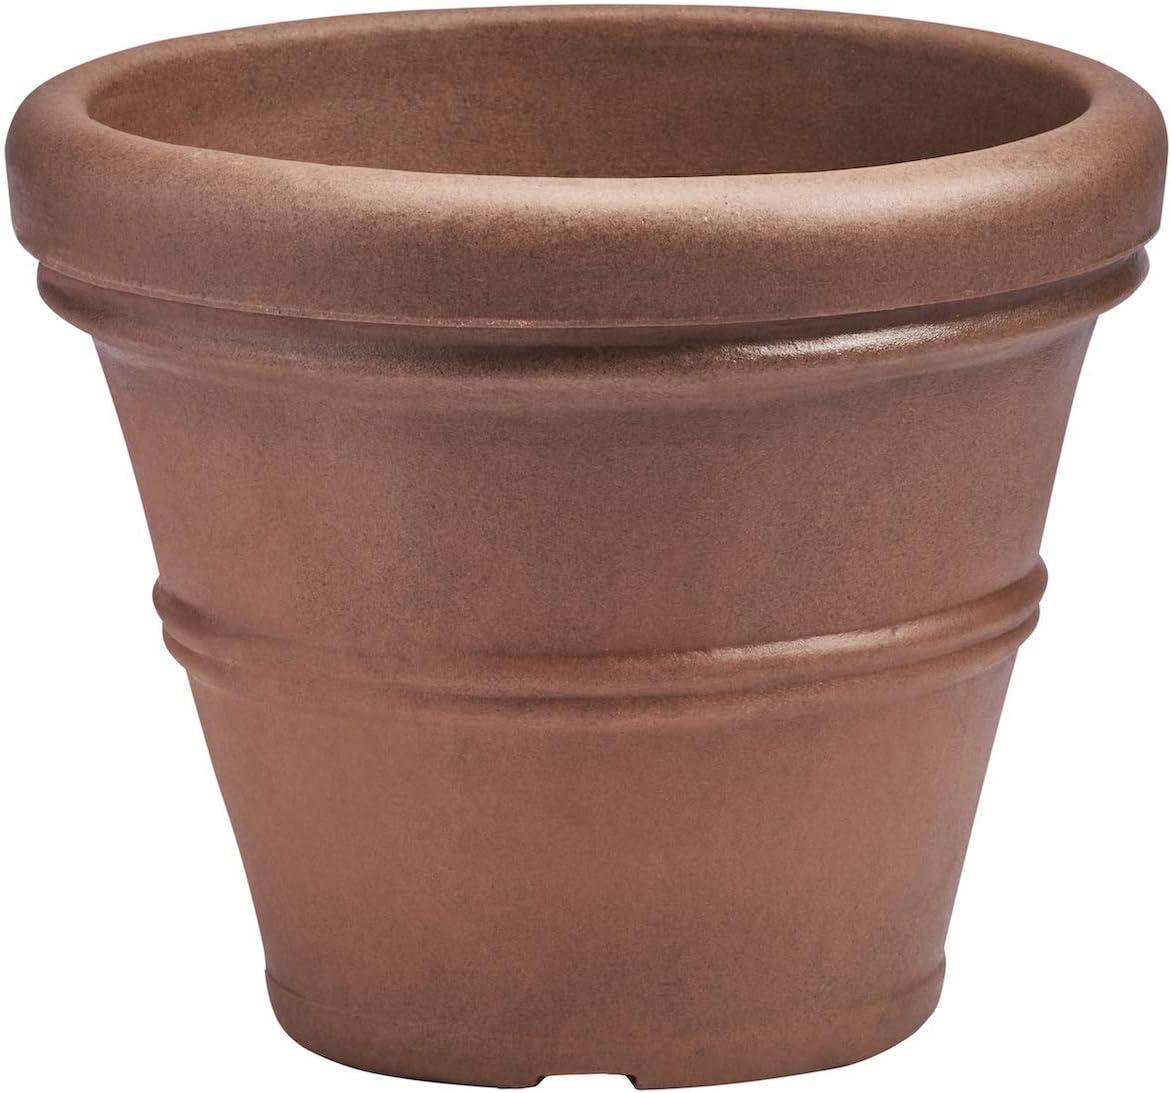 Crescent Garden Brunello Planter, Classic Rolled-Rim Plant Pot, 16-Inch (Rust)